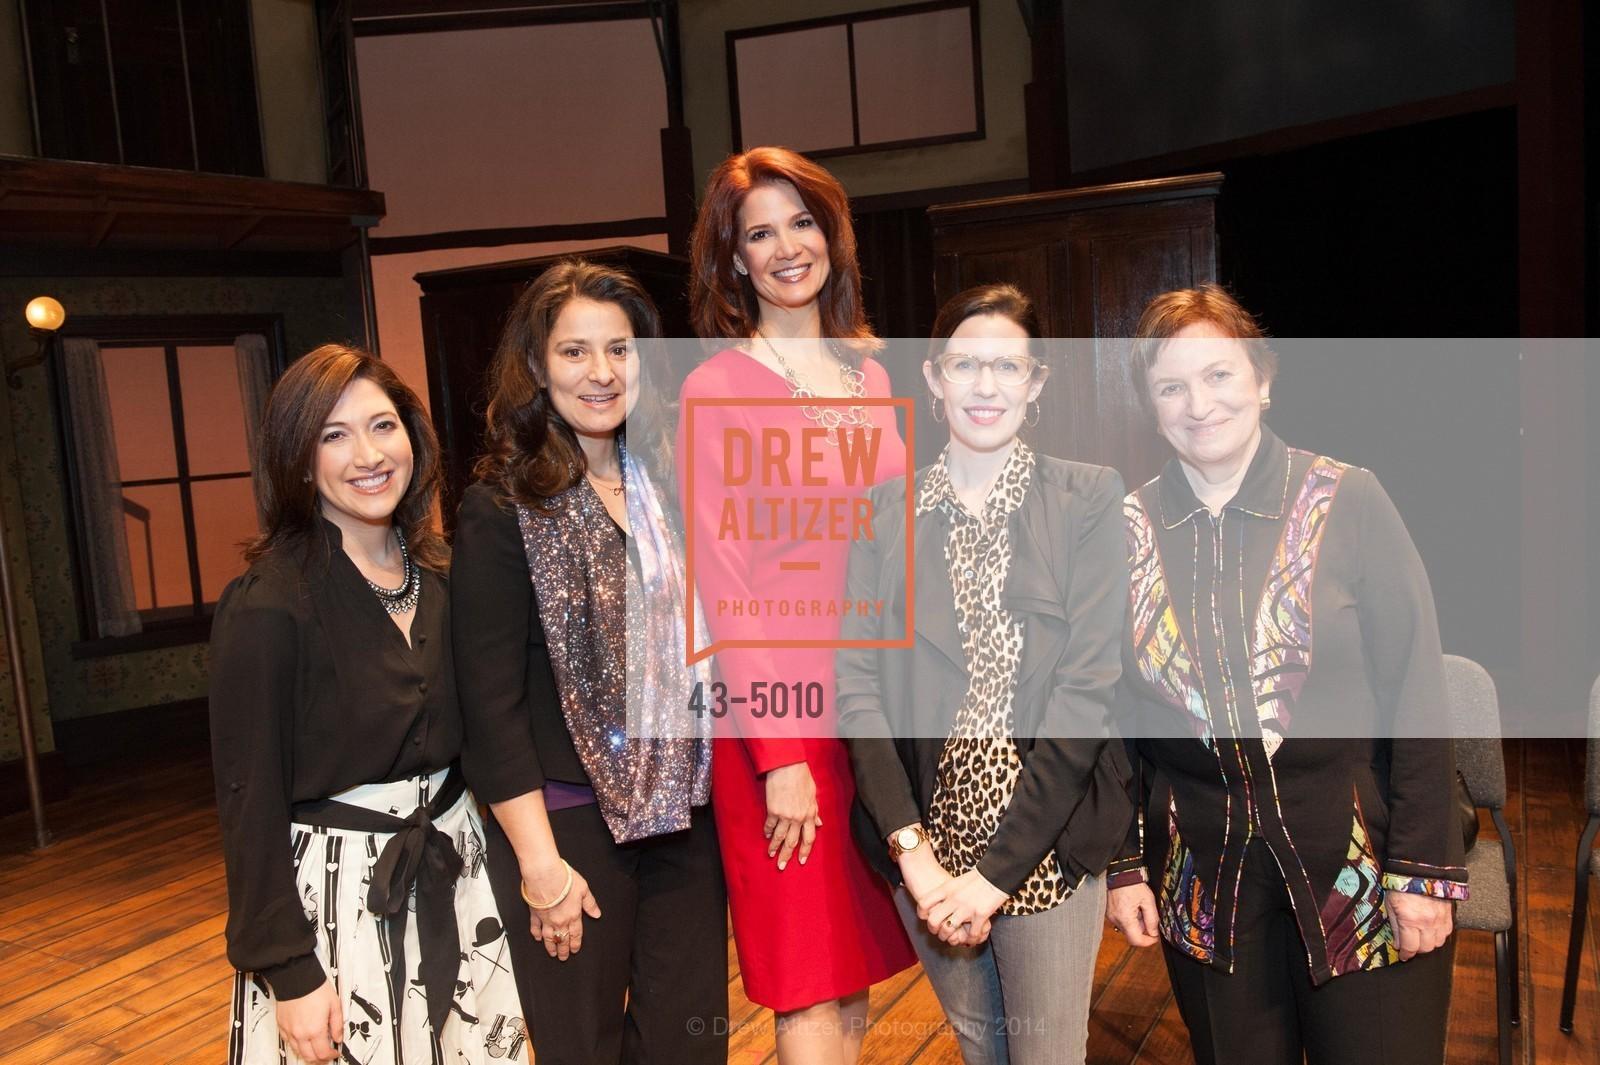 Randi Zuckerberg, Natalie Batalha, Jenny Dearborn, Lauren Gunderson, Ann Bowers, Photo #43-5010